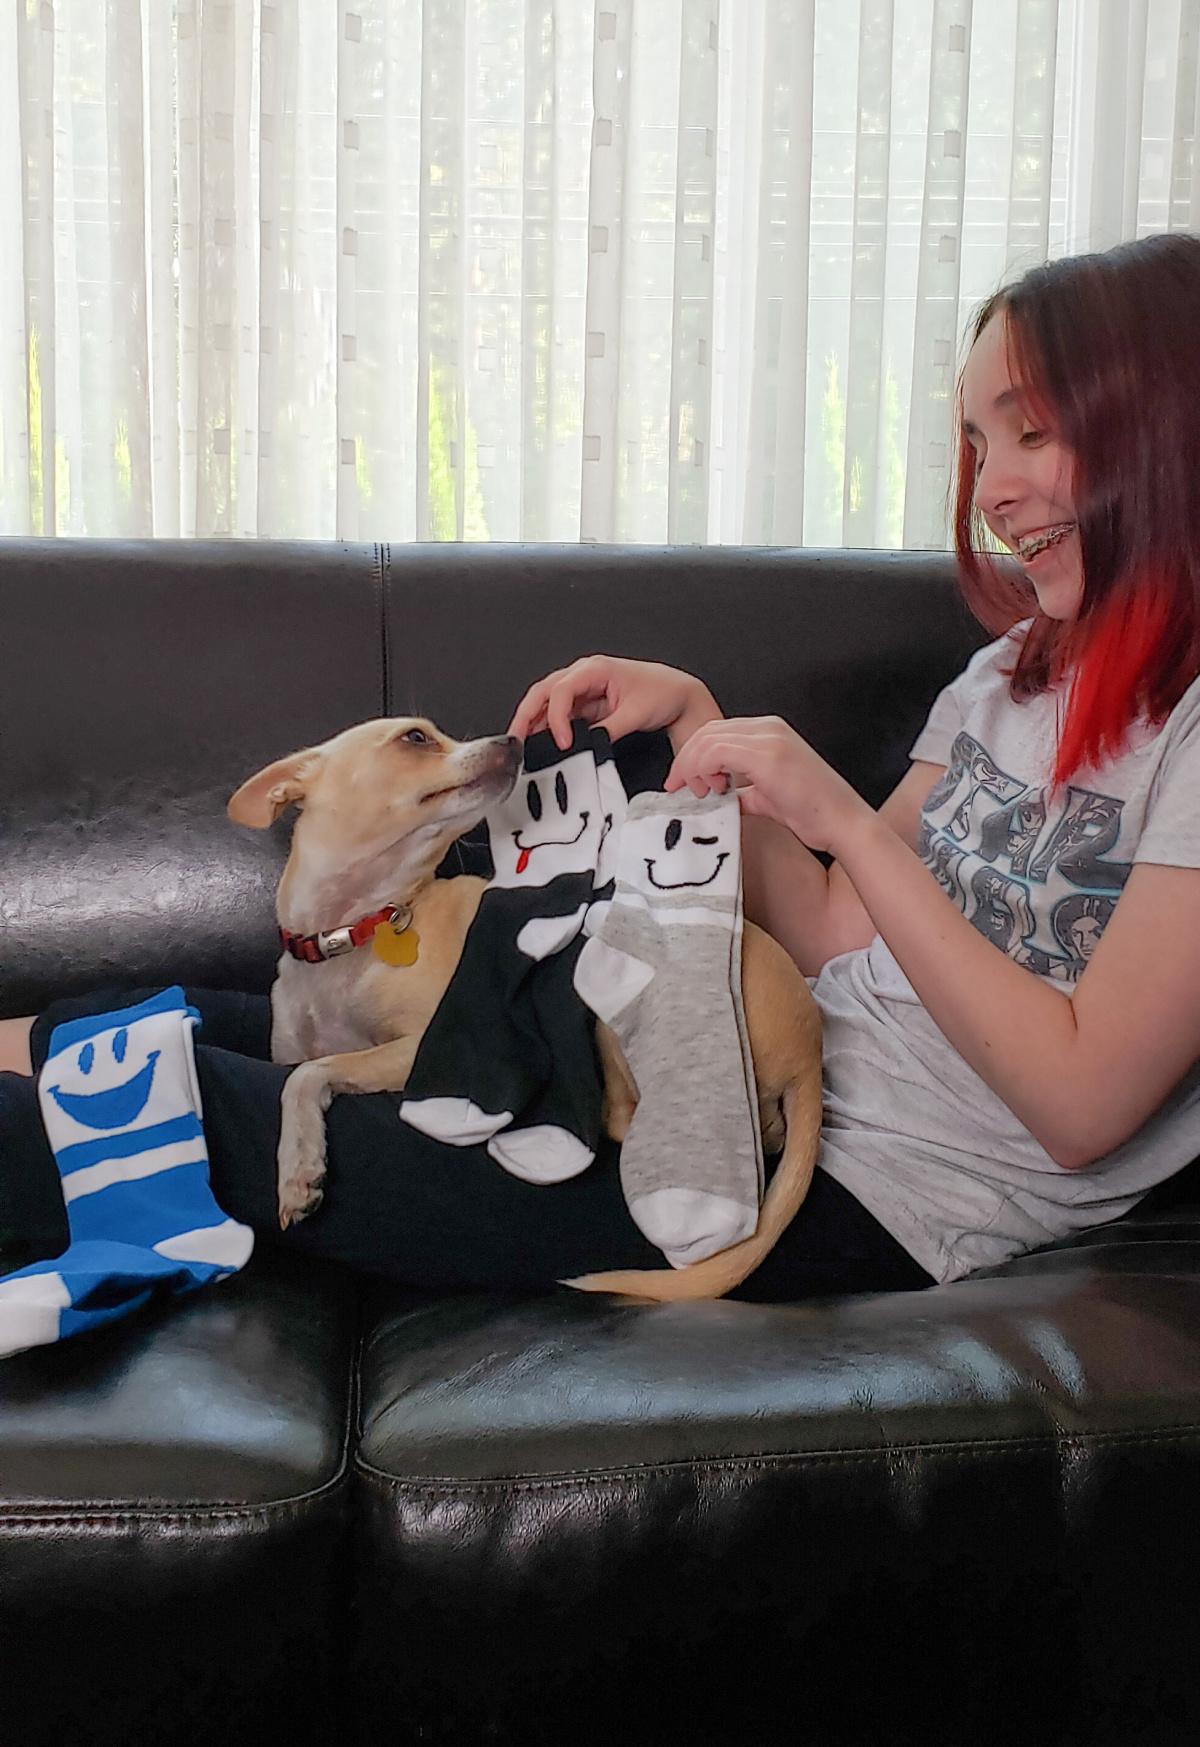 No More Boring Socks – Smile!